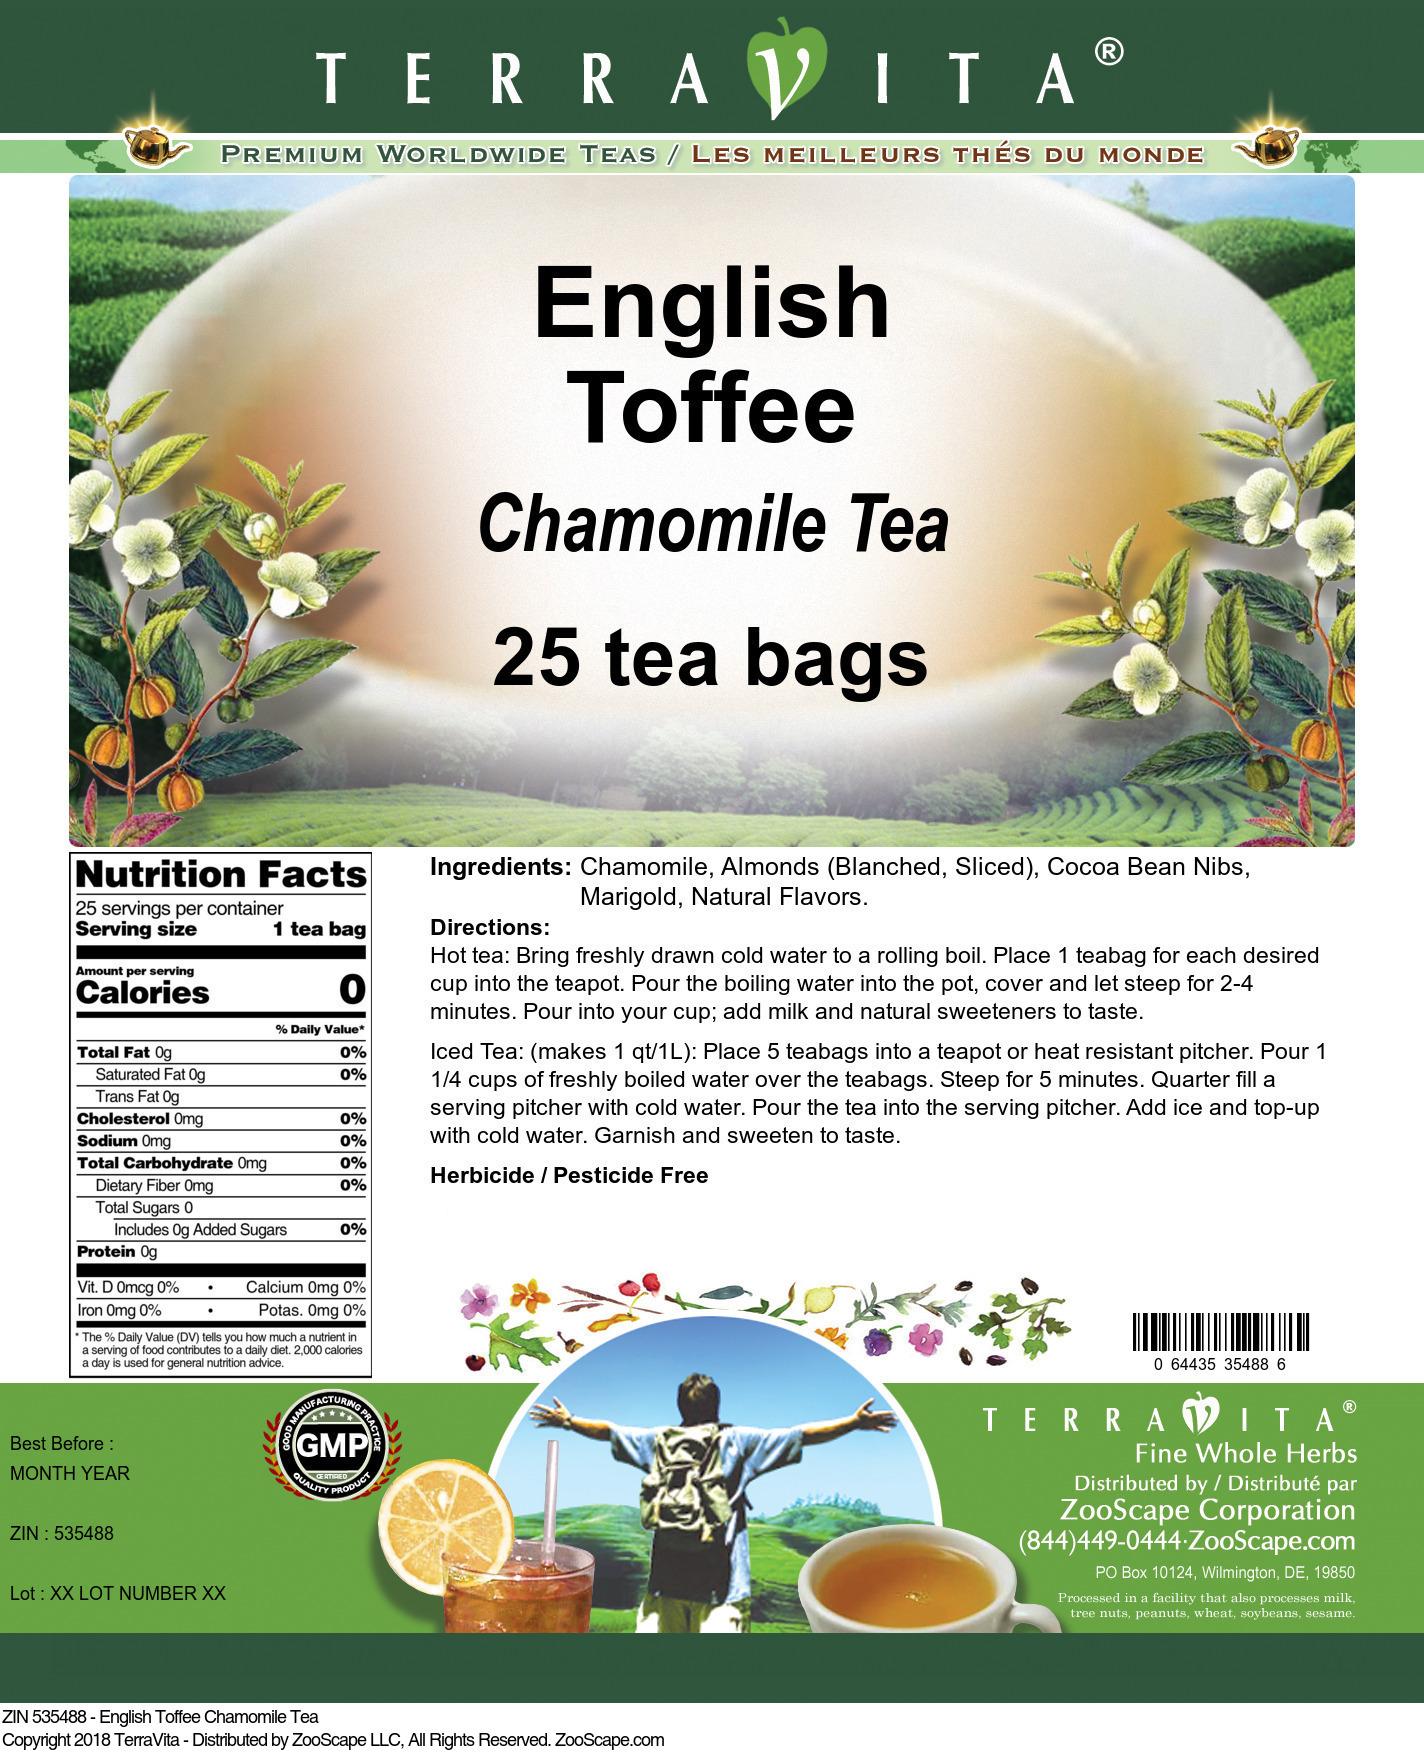 English Toffee Chamomile Tea